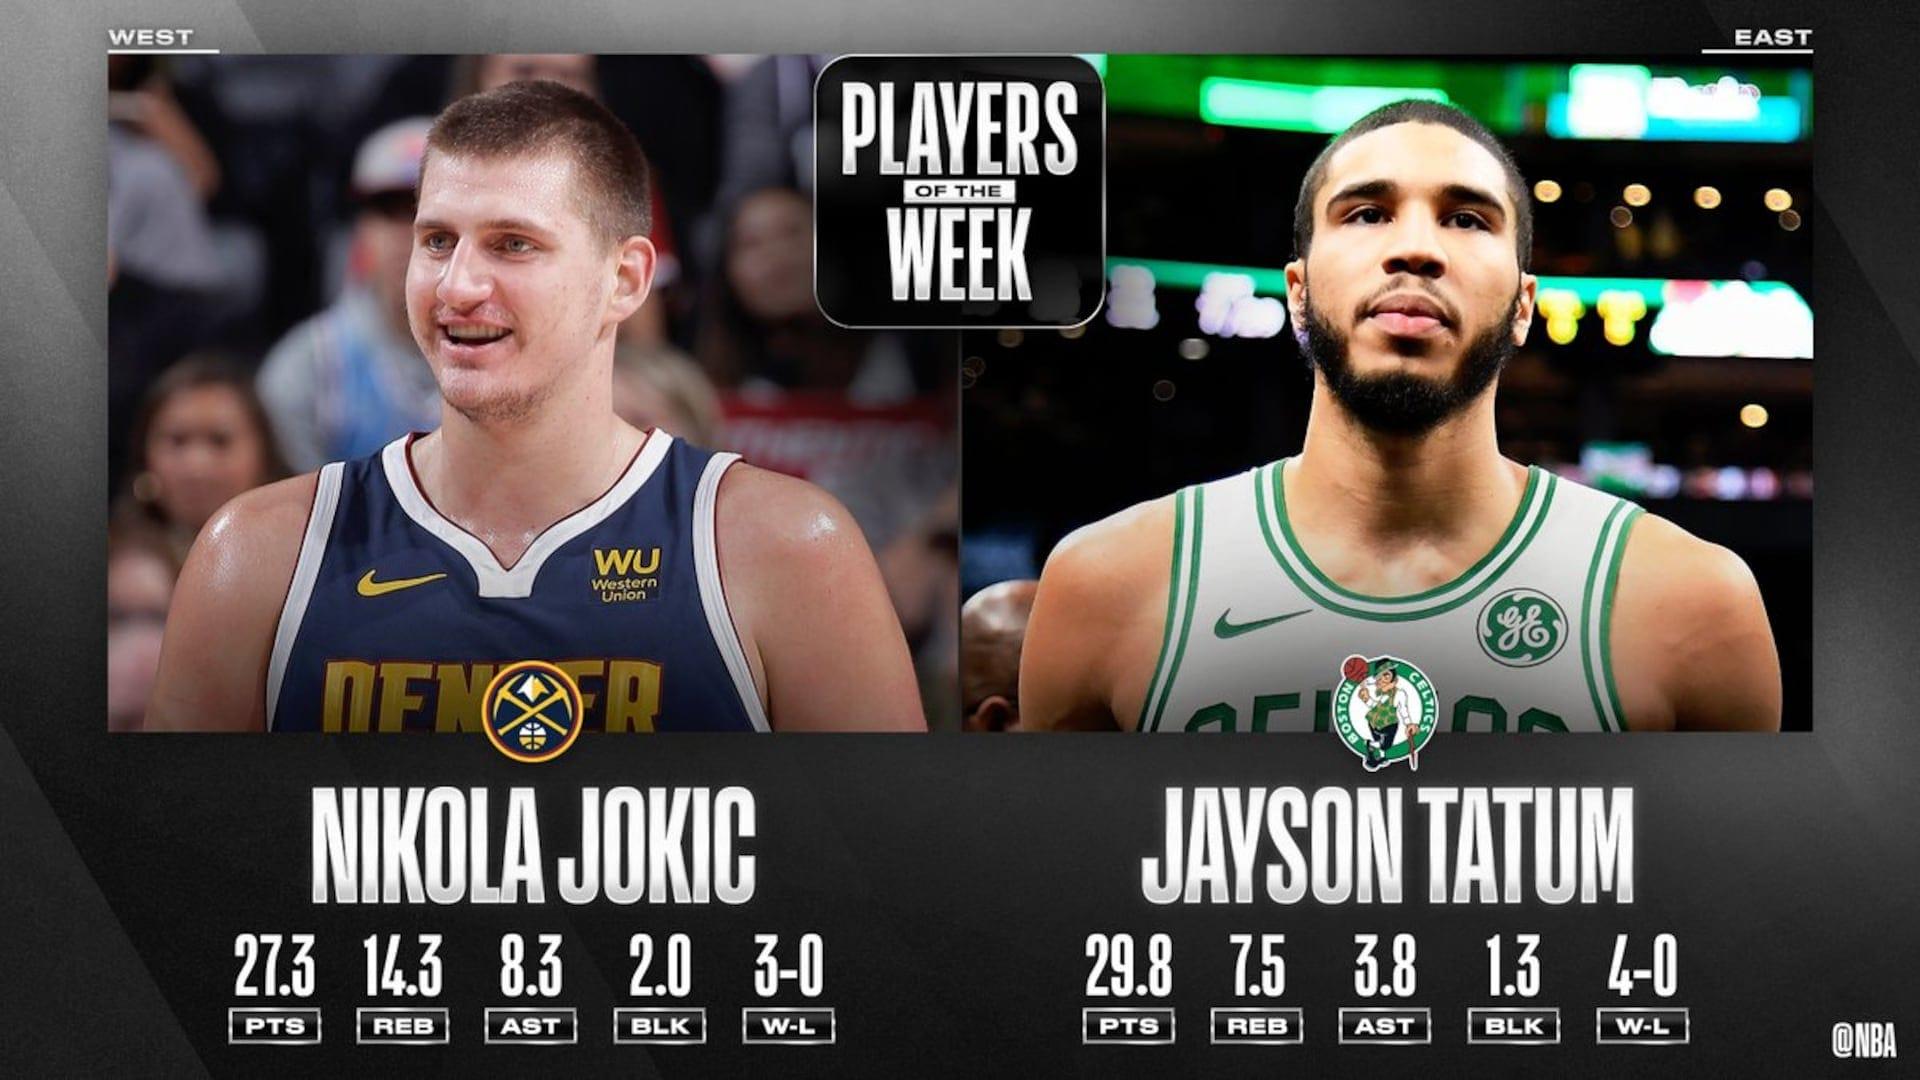 Nikola Jokic, Jayson Tatum named NBA Players of the Week